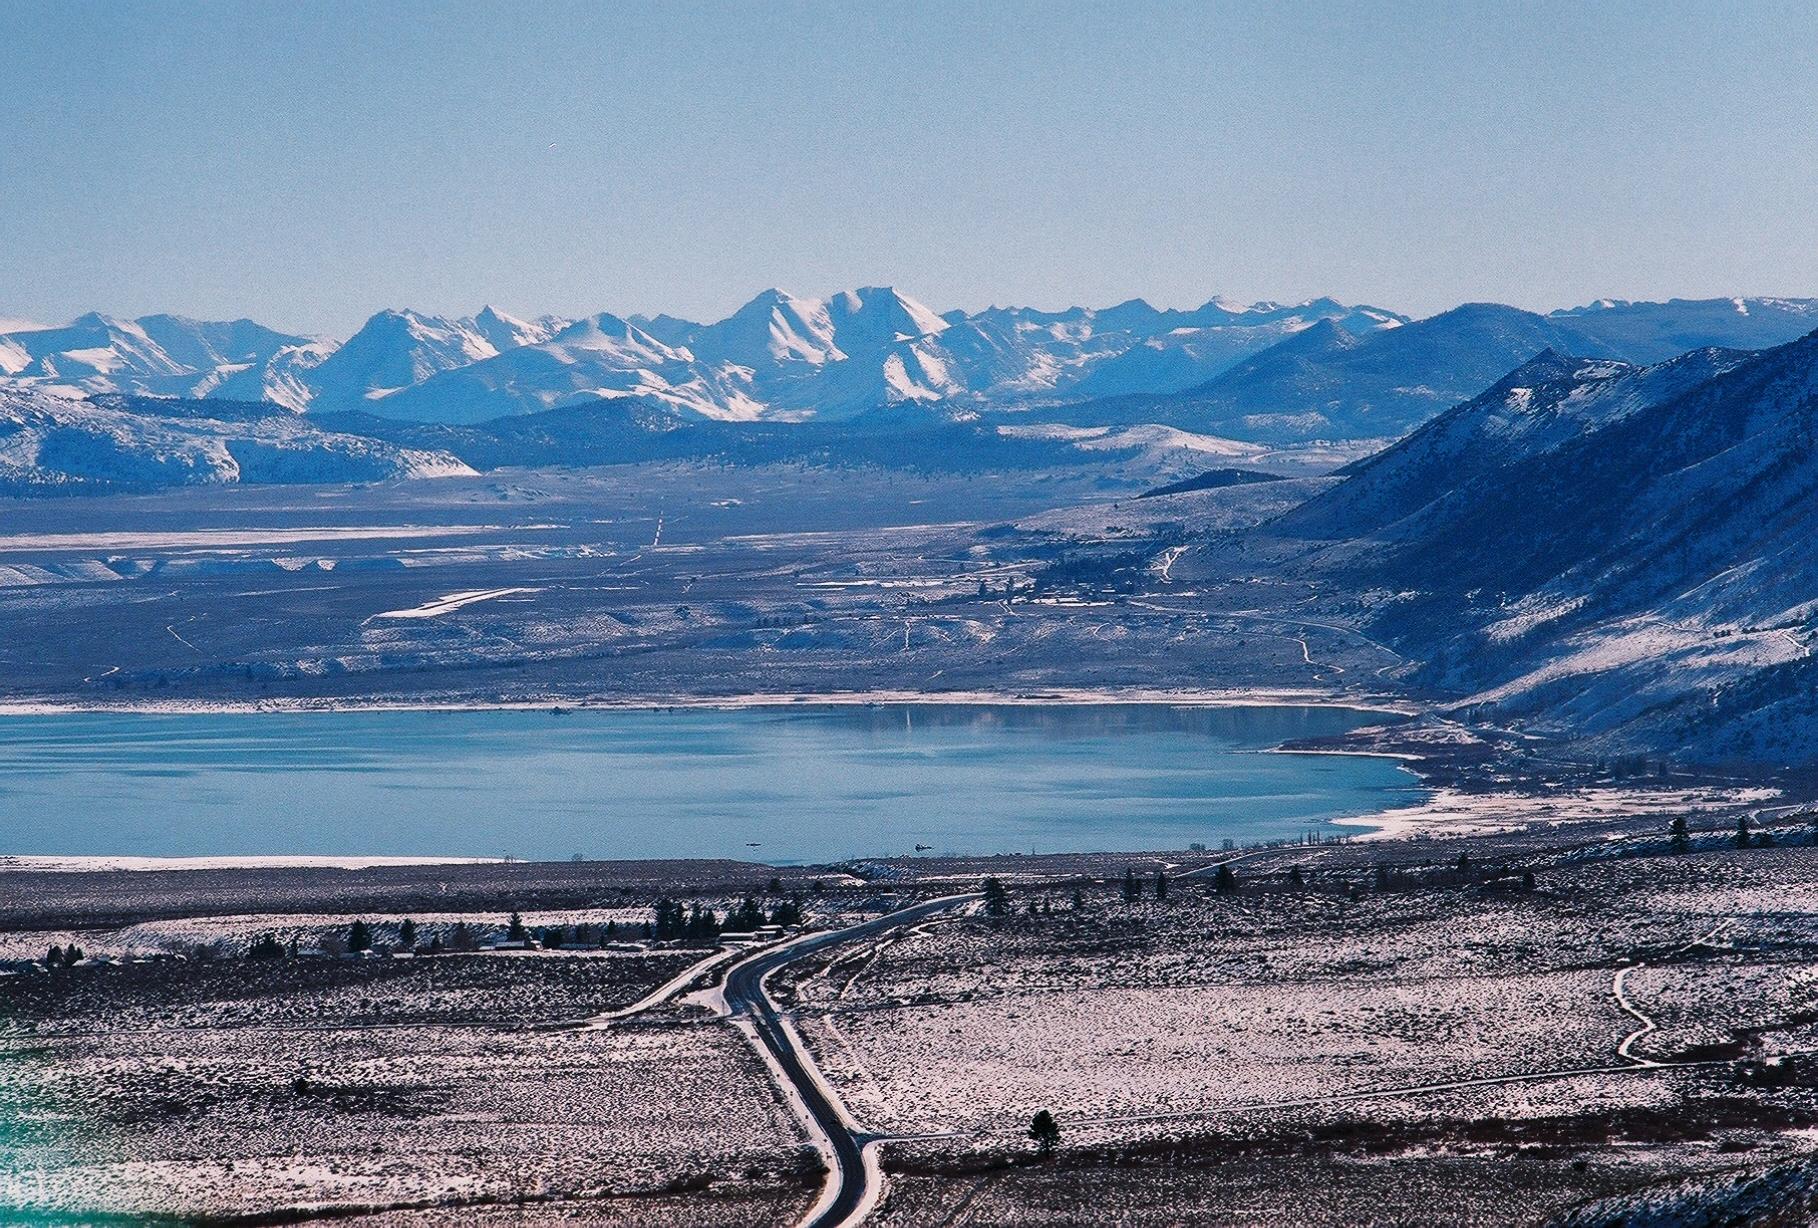 Film photograph of Mono Lake California